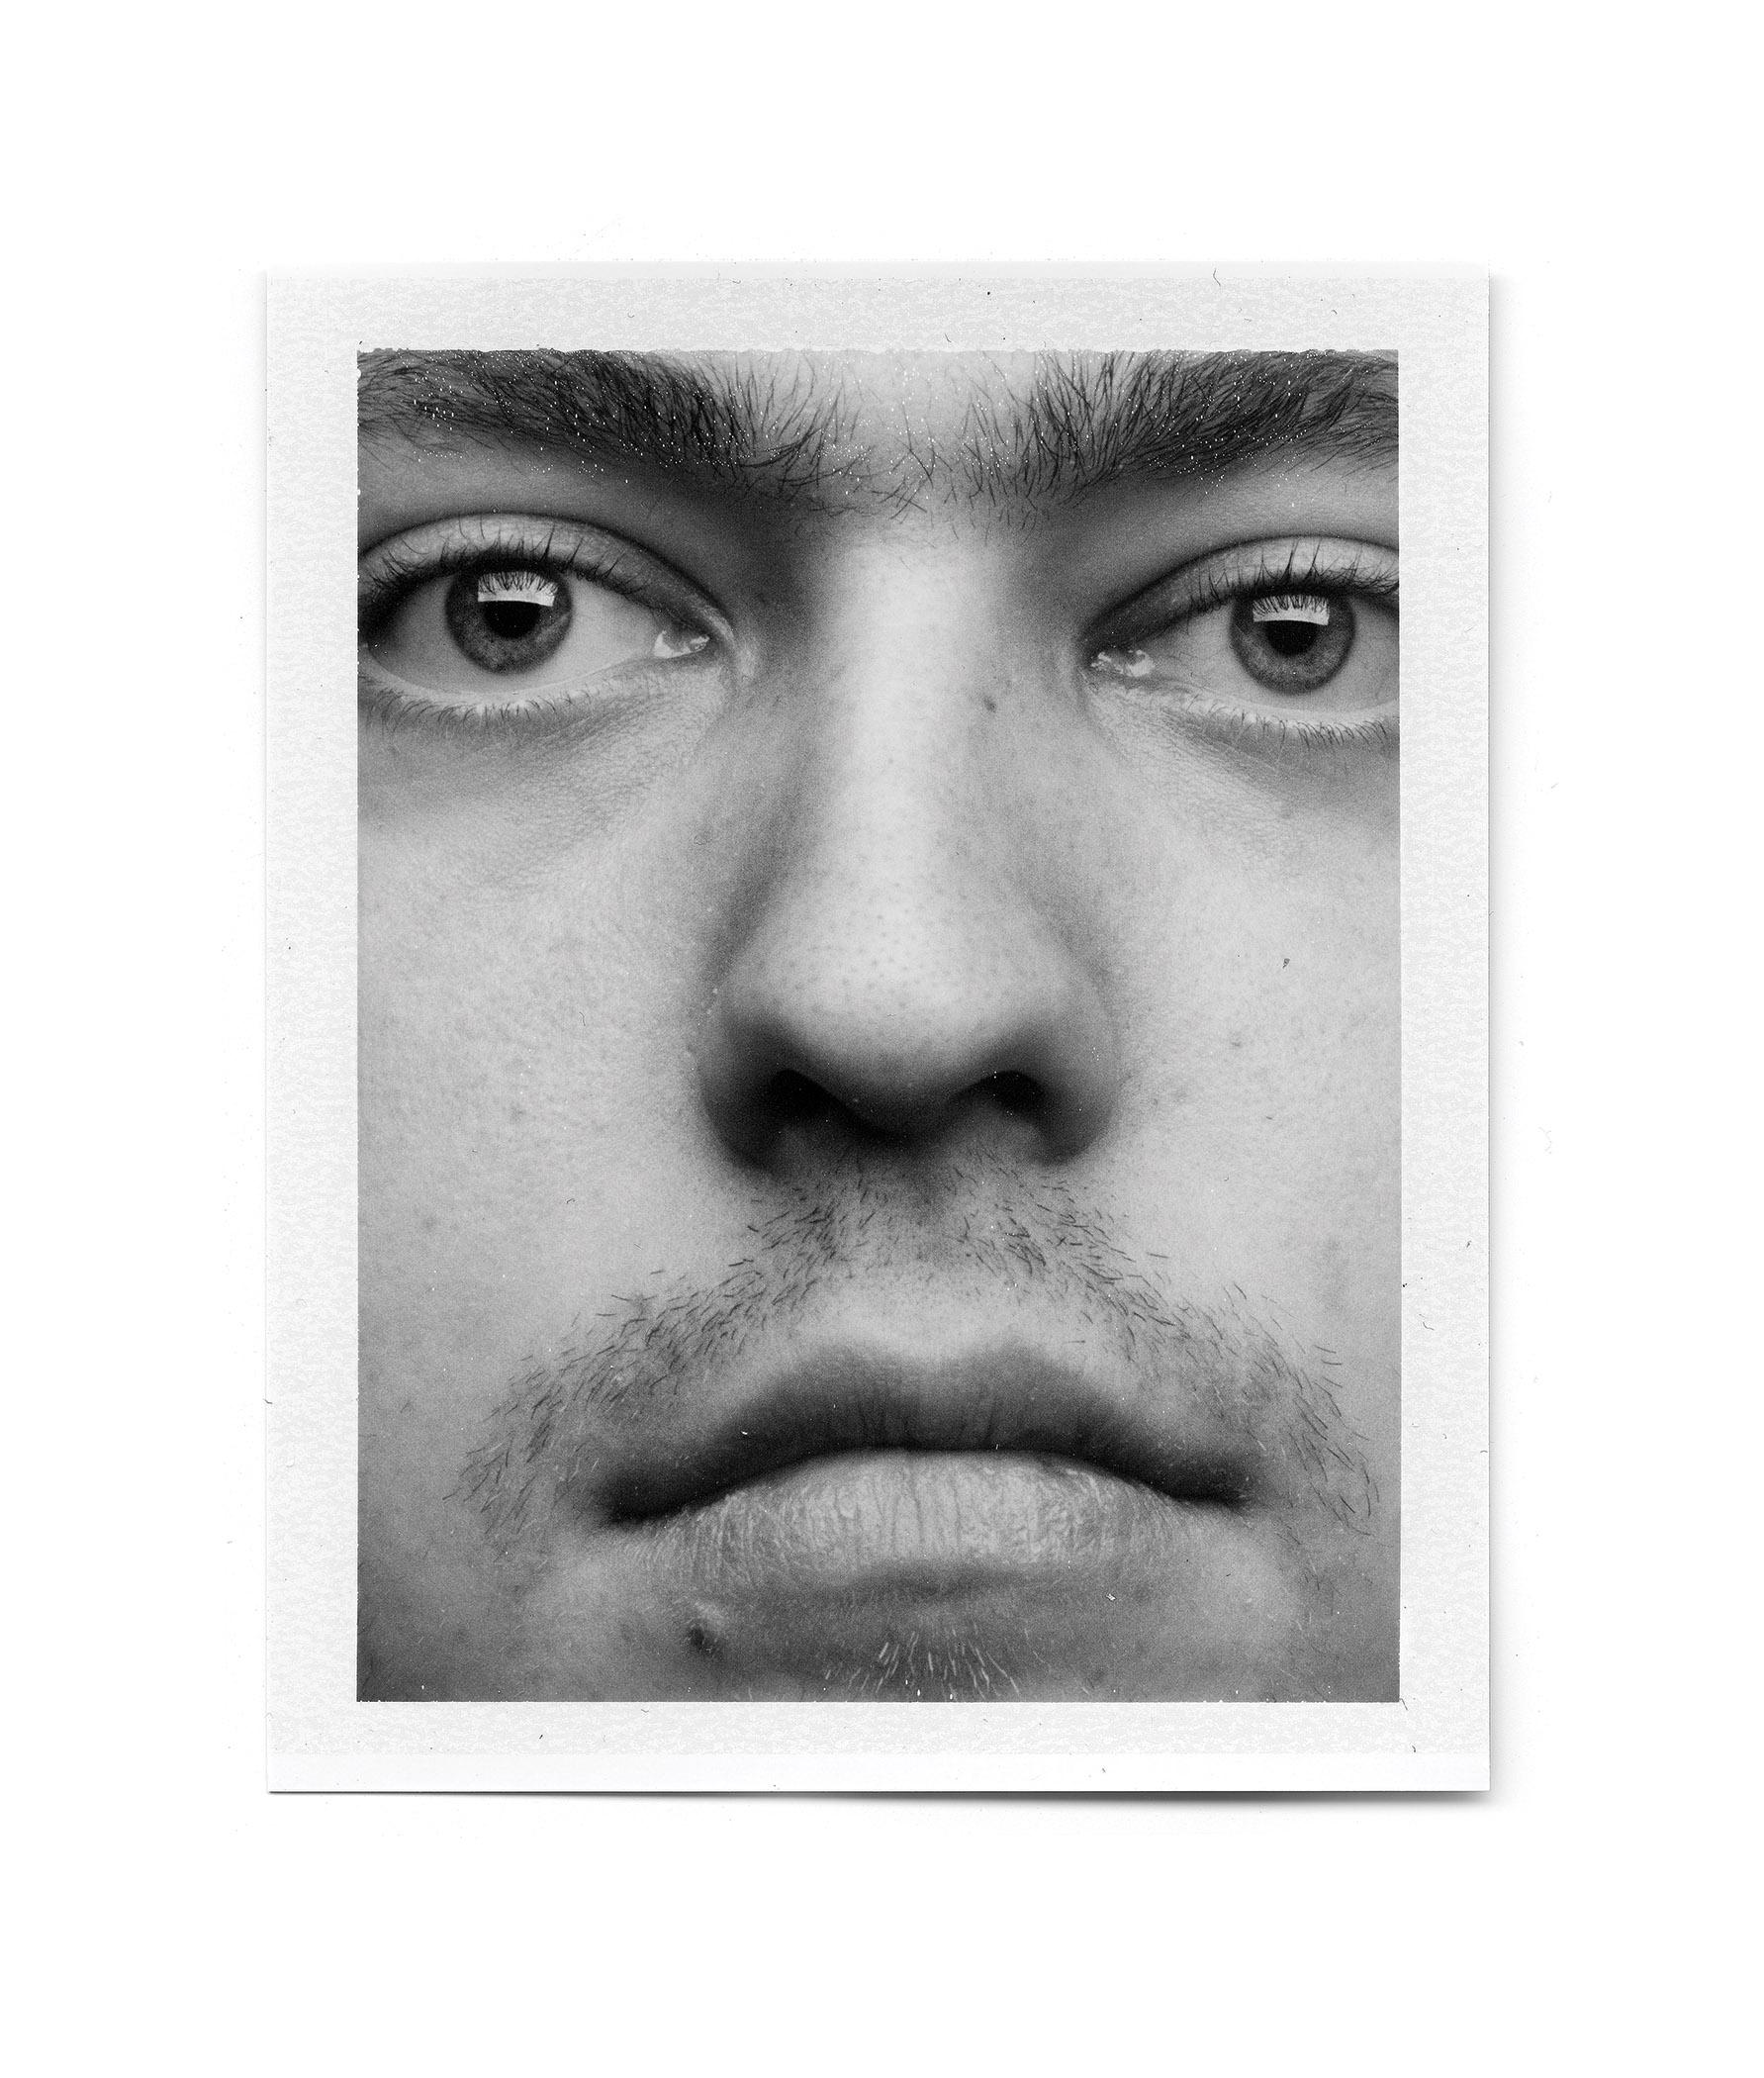 Ben Freedman, Dear Departed: Plate #3, 2013